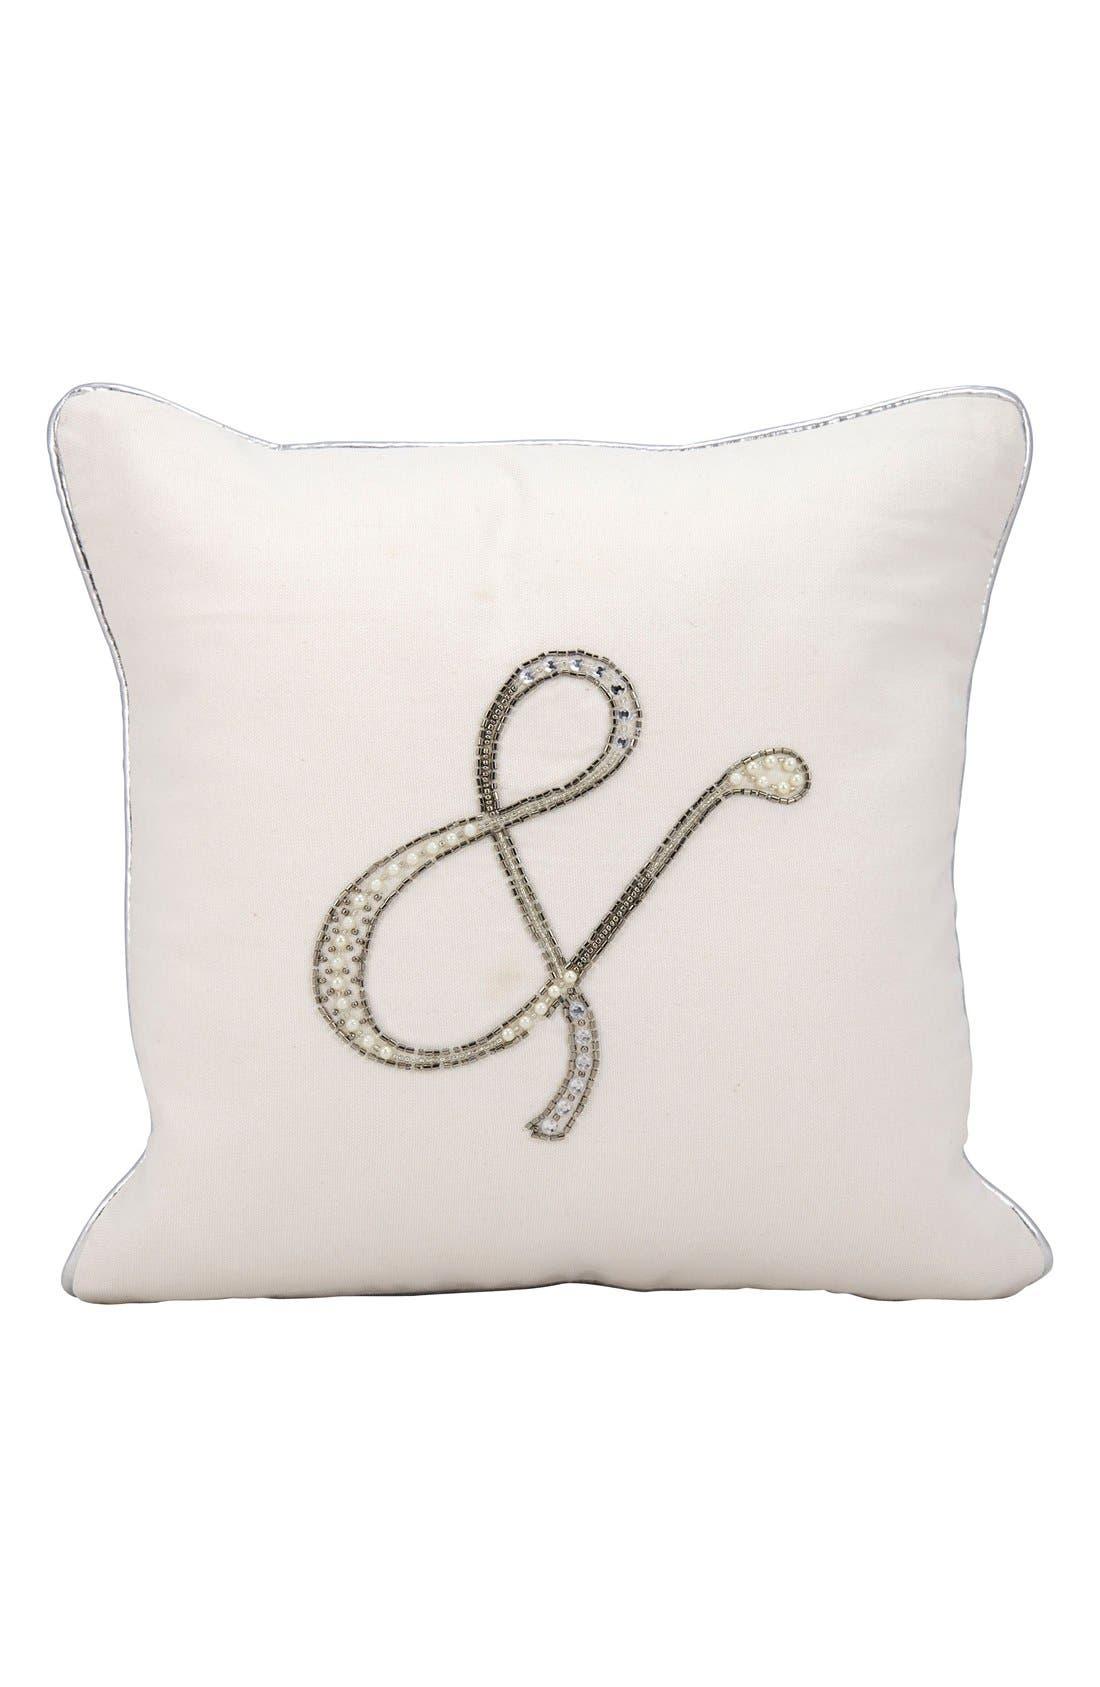 Embellished Wedding Pillow,                             Main thumbnail 1, color,                             100